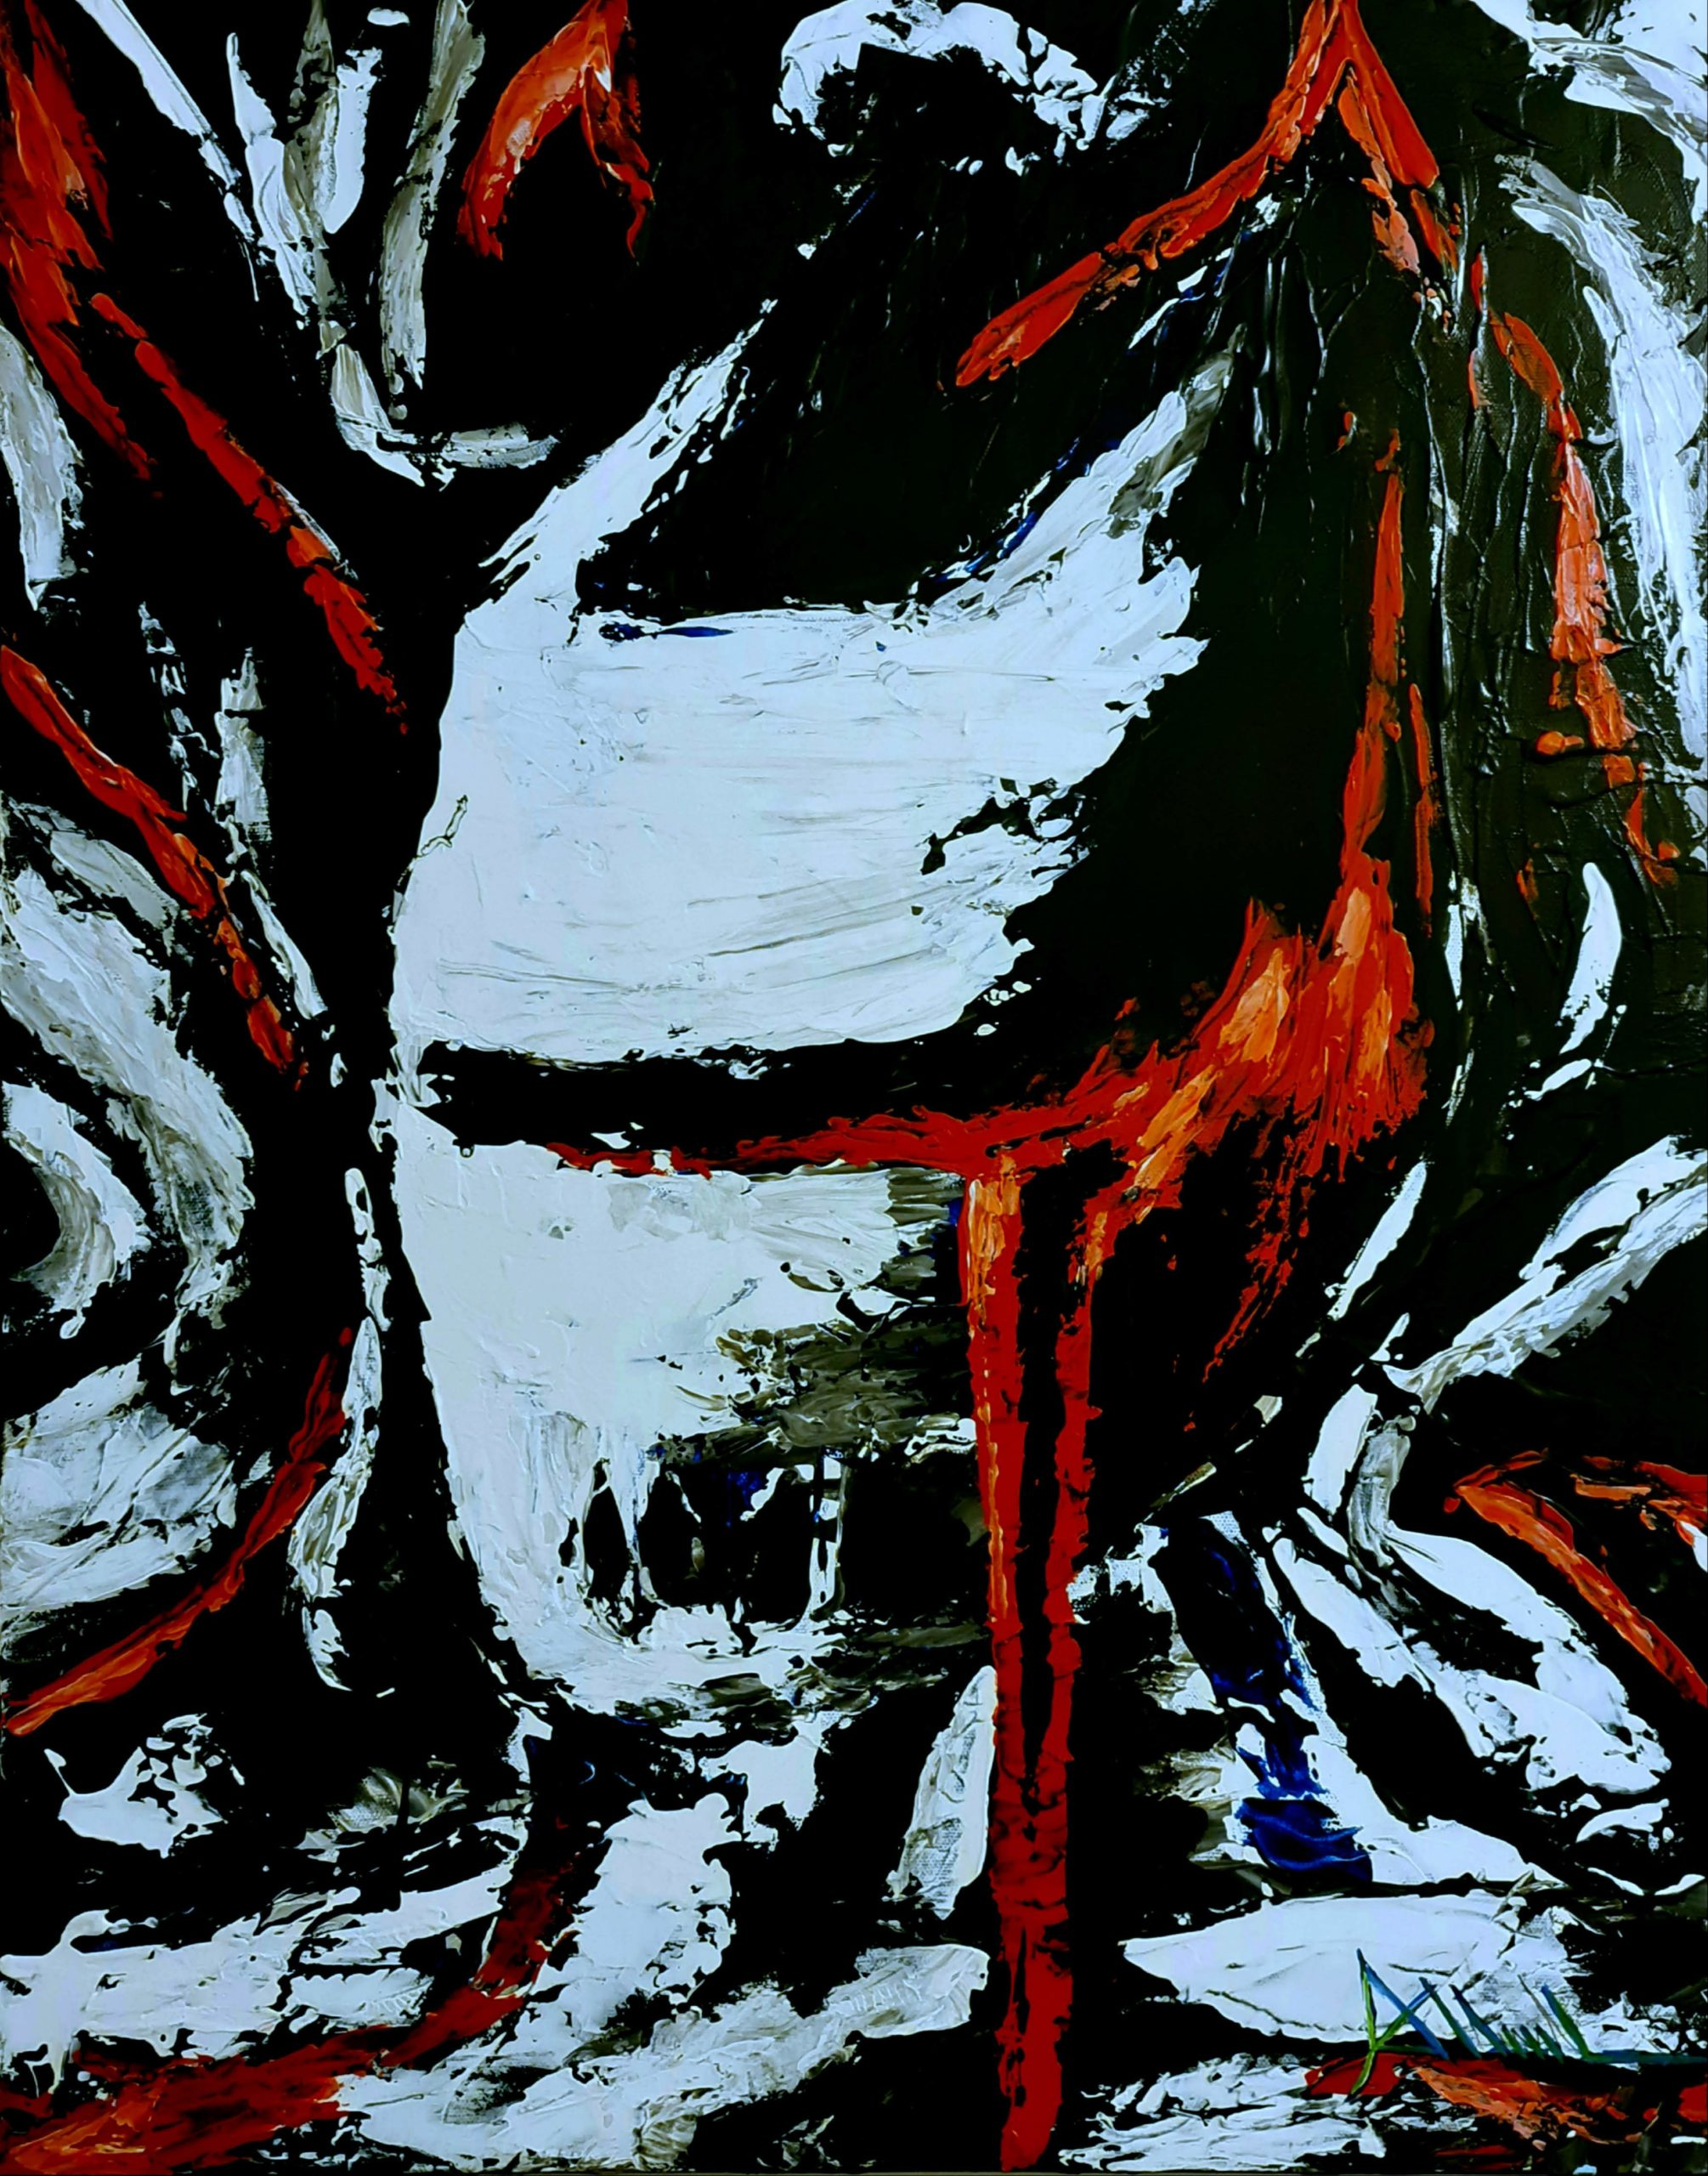 Aaron Lloyd, Momentum 2020, Acrylic on Canvas